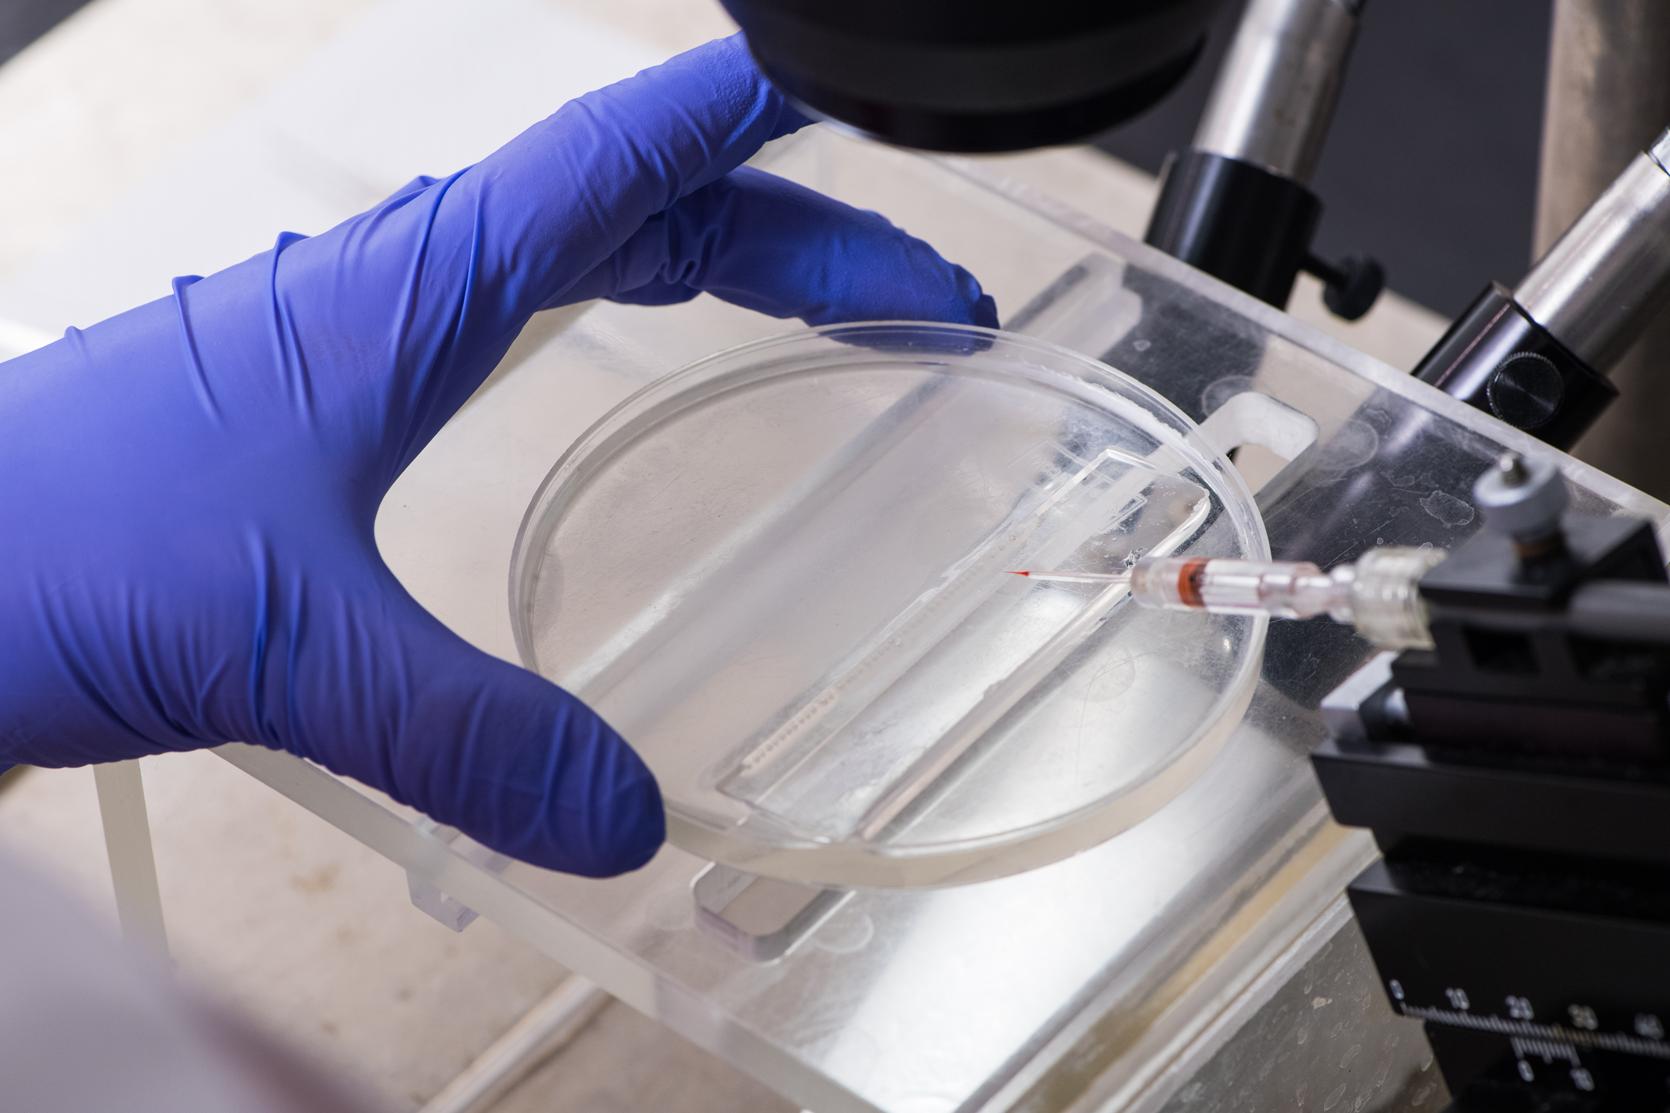 Researcher using microscope to examine zebrafish embryos